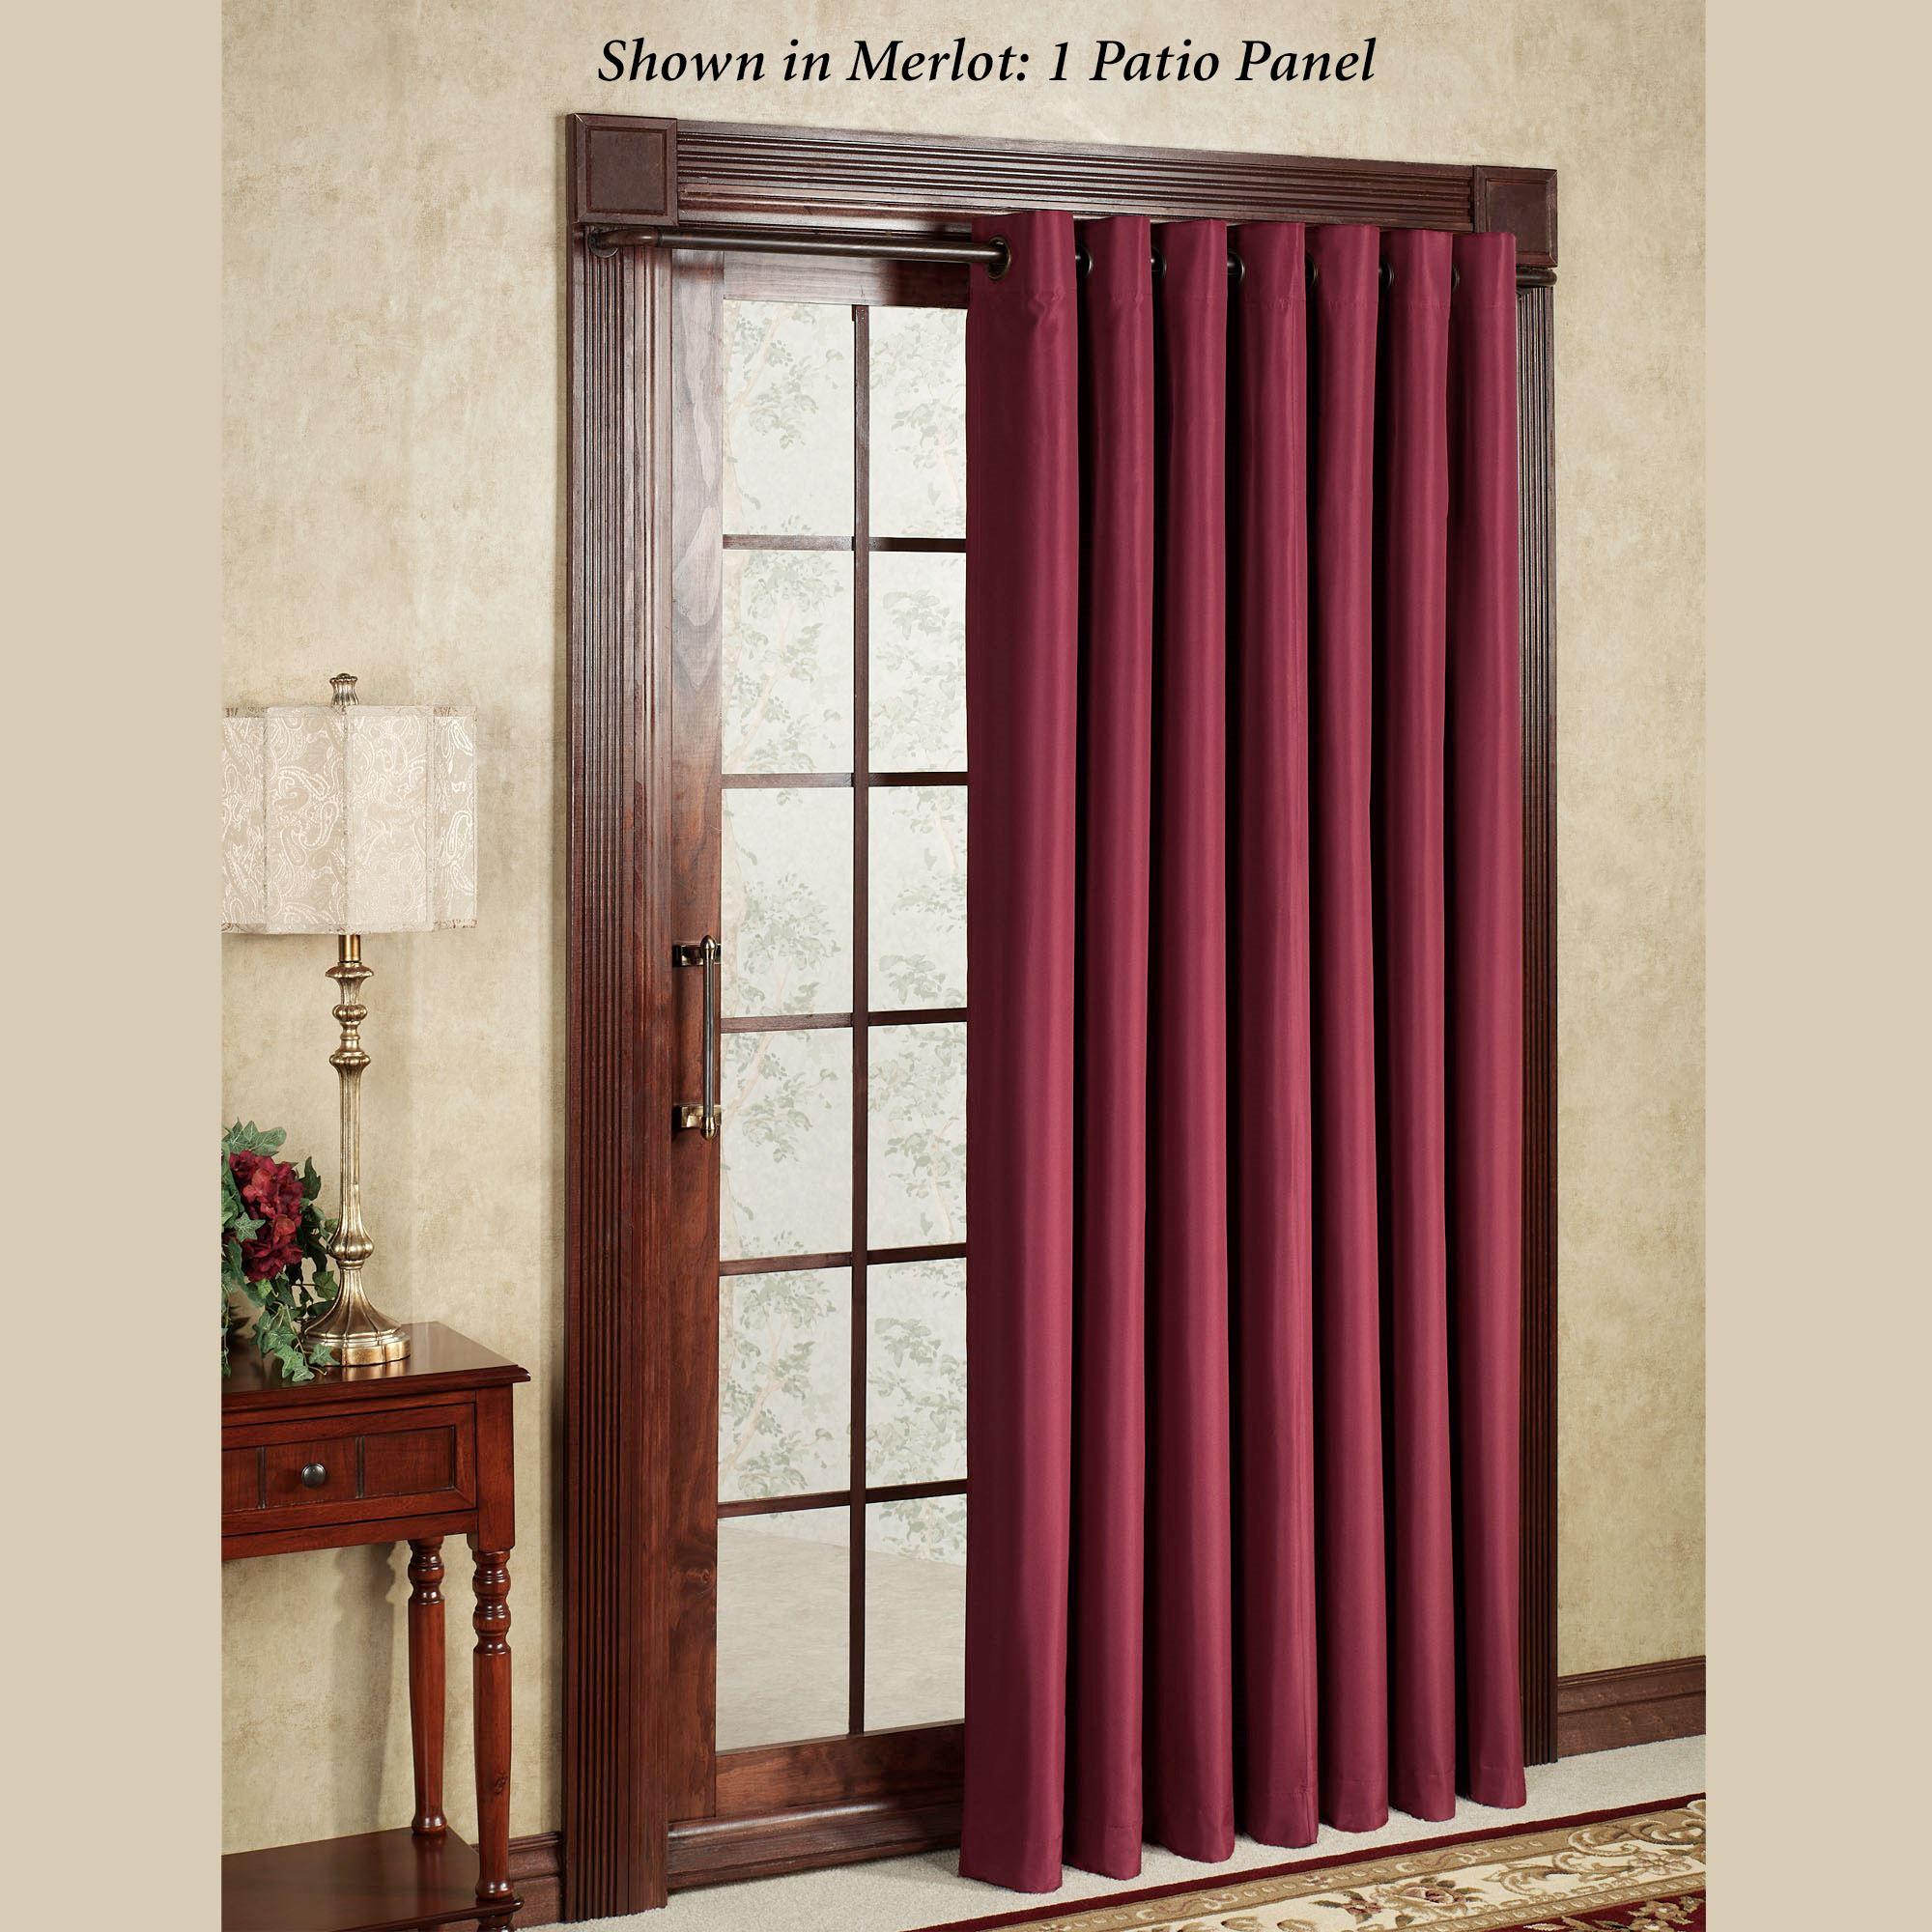 Thermal Elegance Grommet Patio Panel Pertaining To Grommet Blackout Patio Door Window Curtain Panels (View 13 of 20)